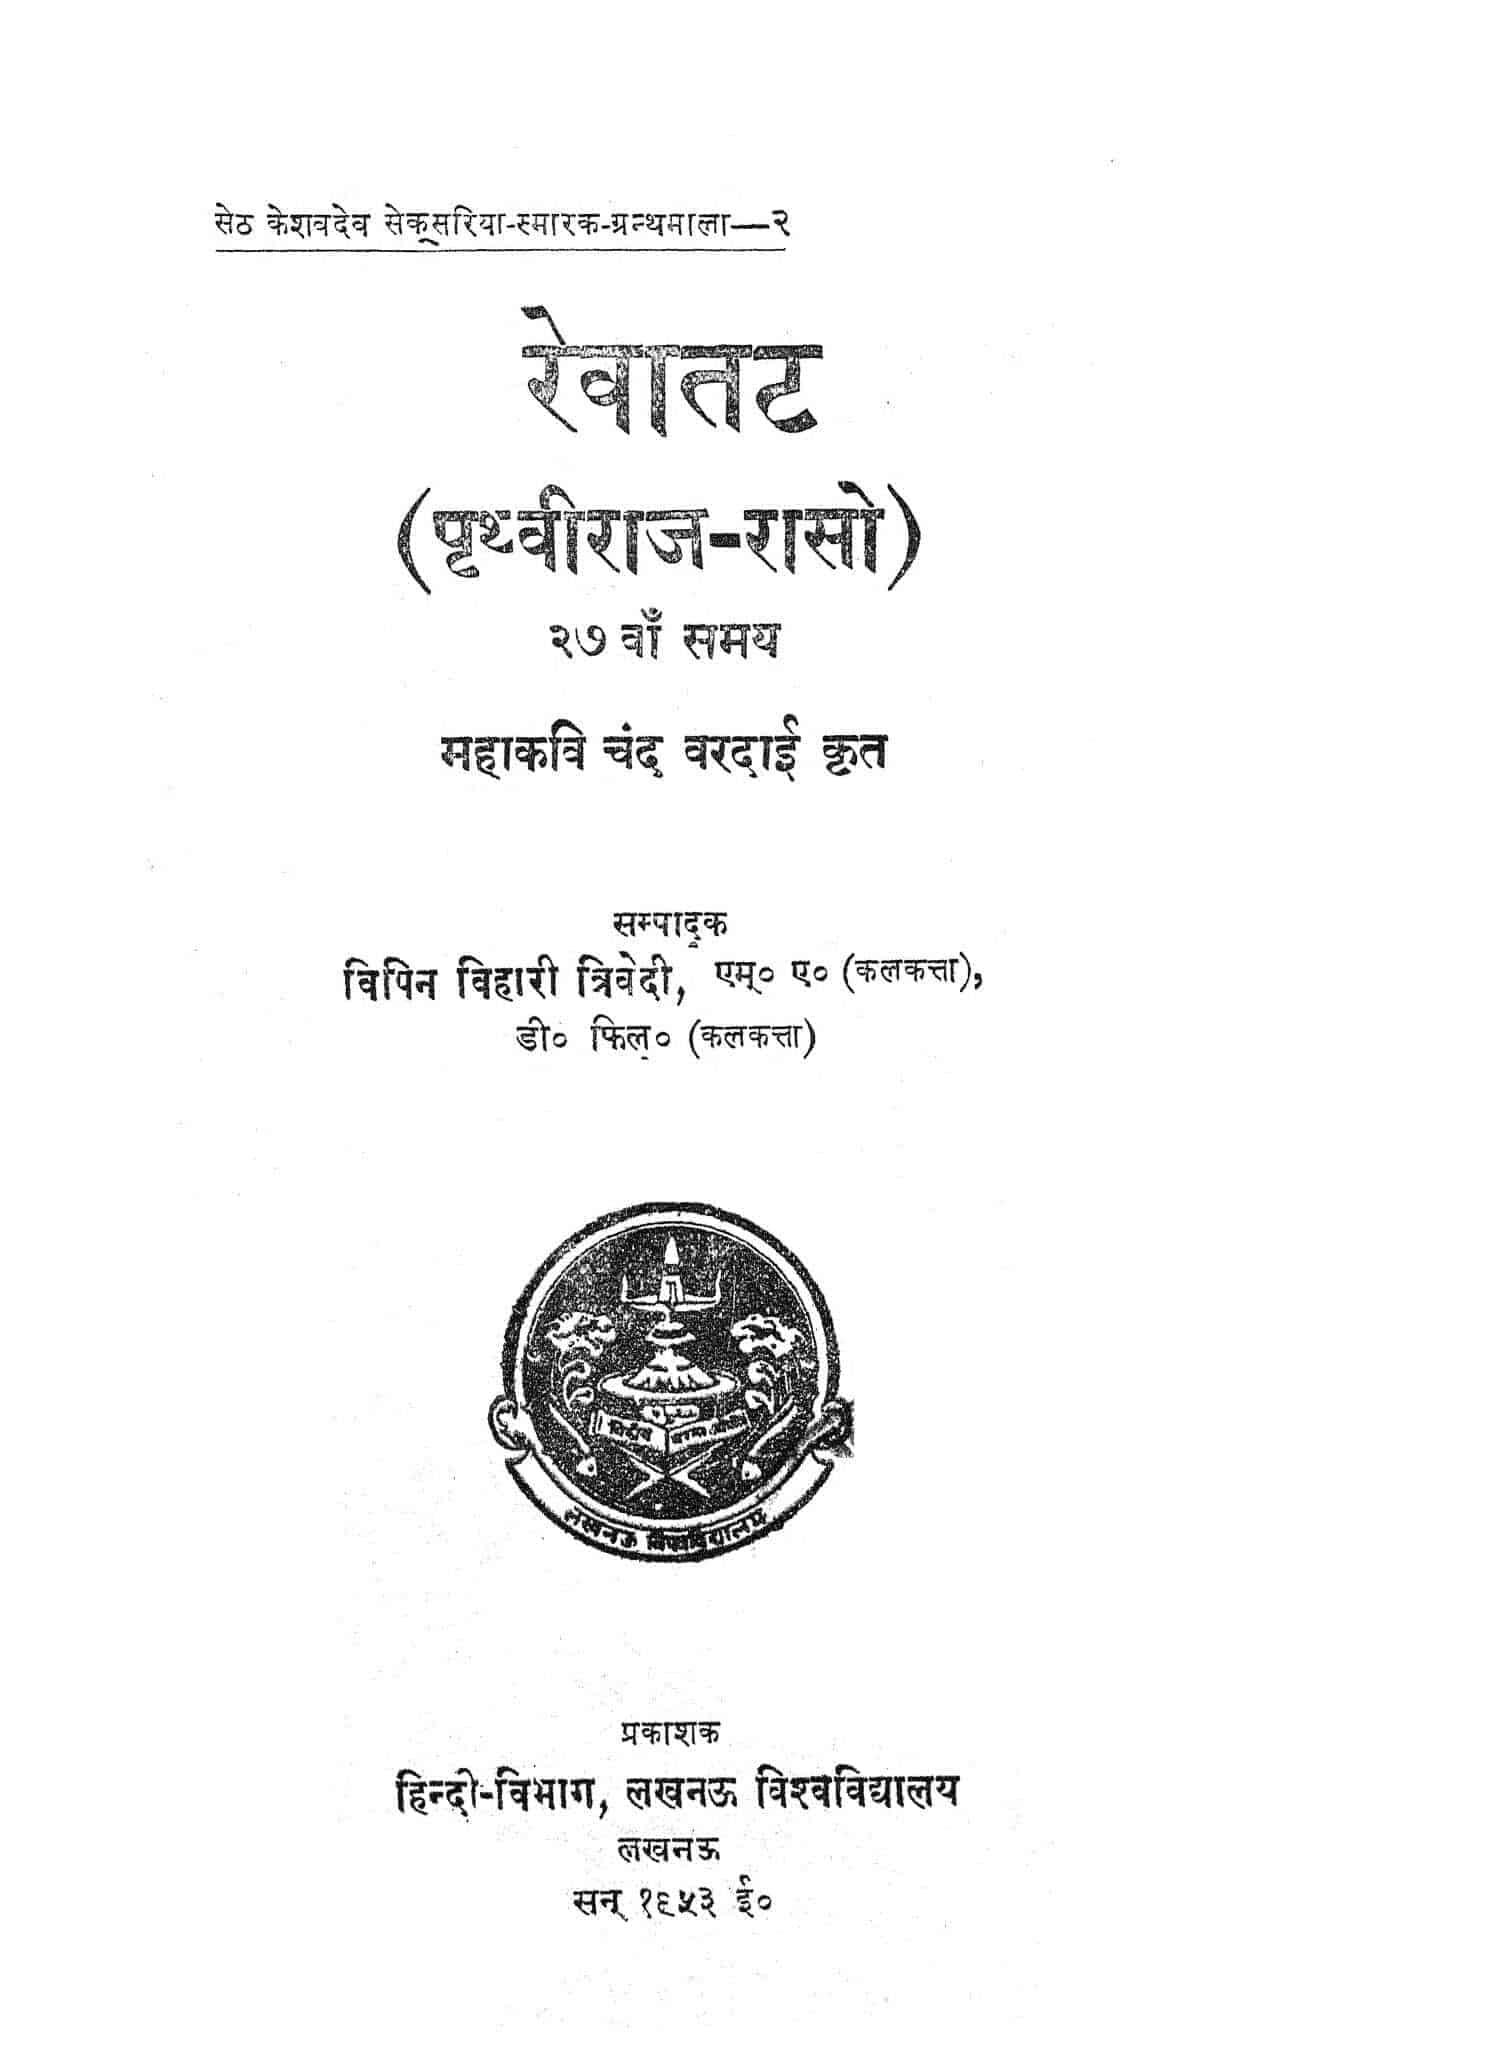 Book Image : रेवातट पृथ्वीराज रासो  - Rewatat prithviraj-raso